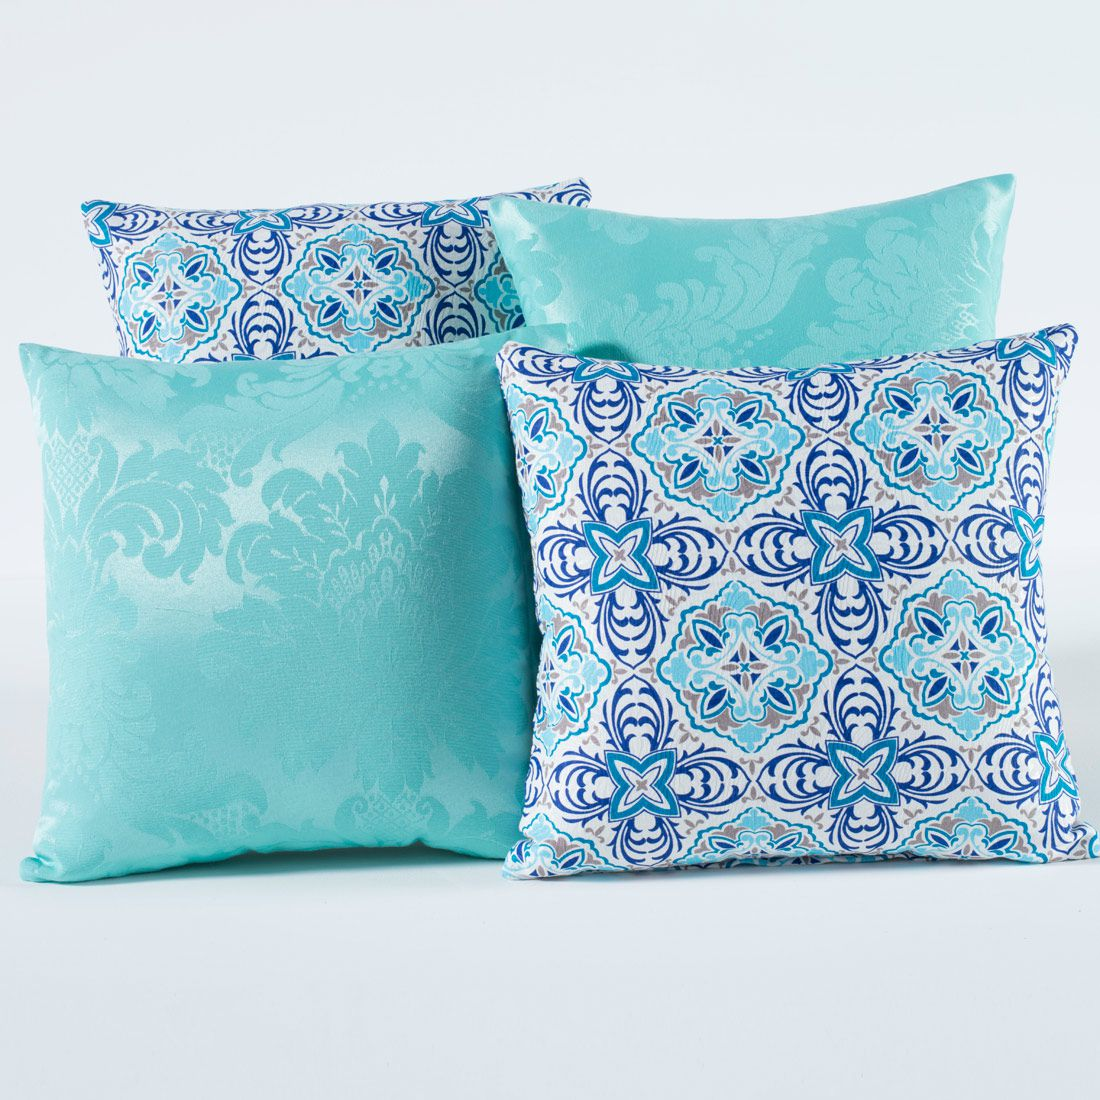 Kit c/ 4 Almofadas Cheias Decorativas Mandala Azul Turquesa 04 Peças c/ Refil